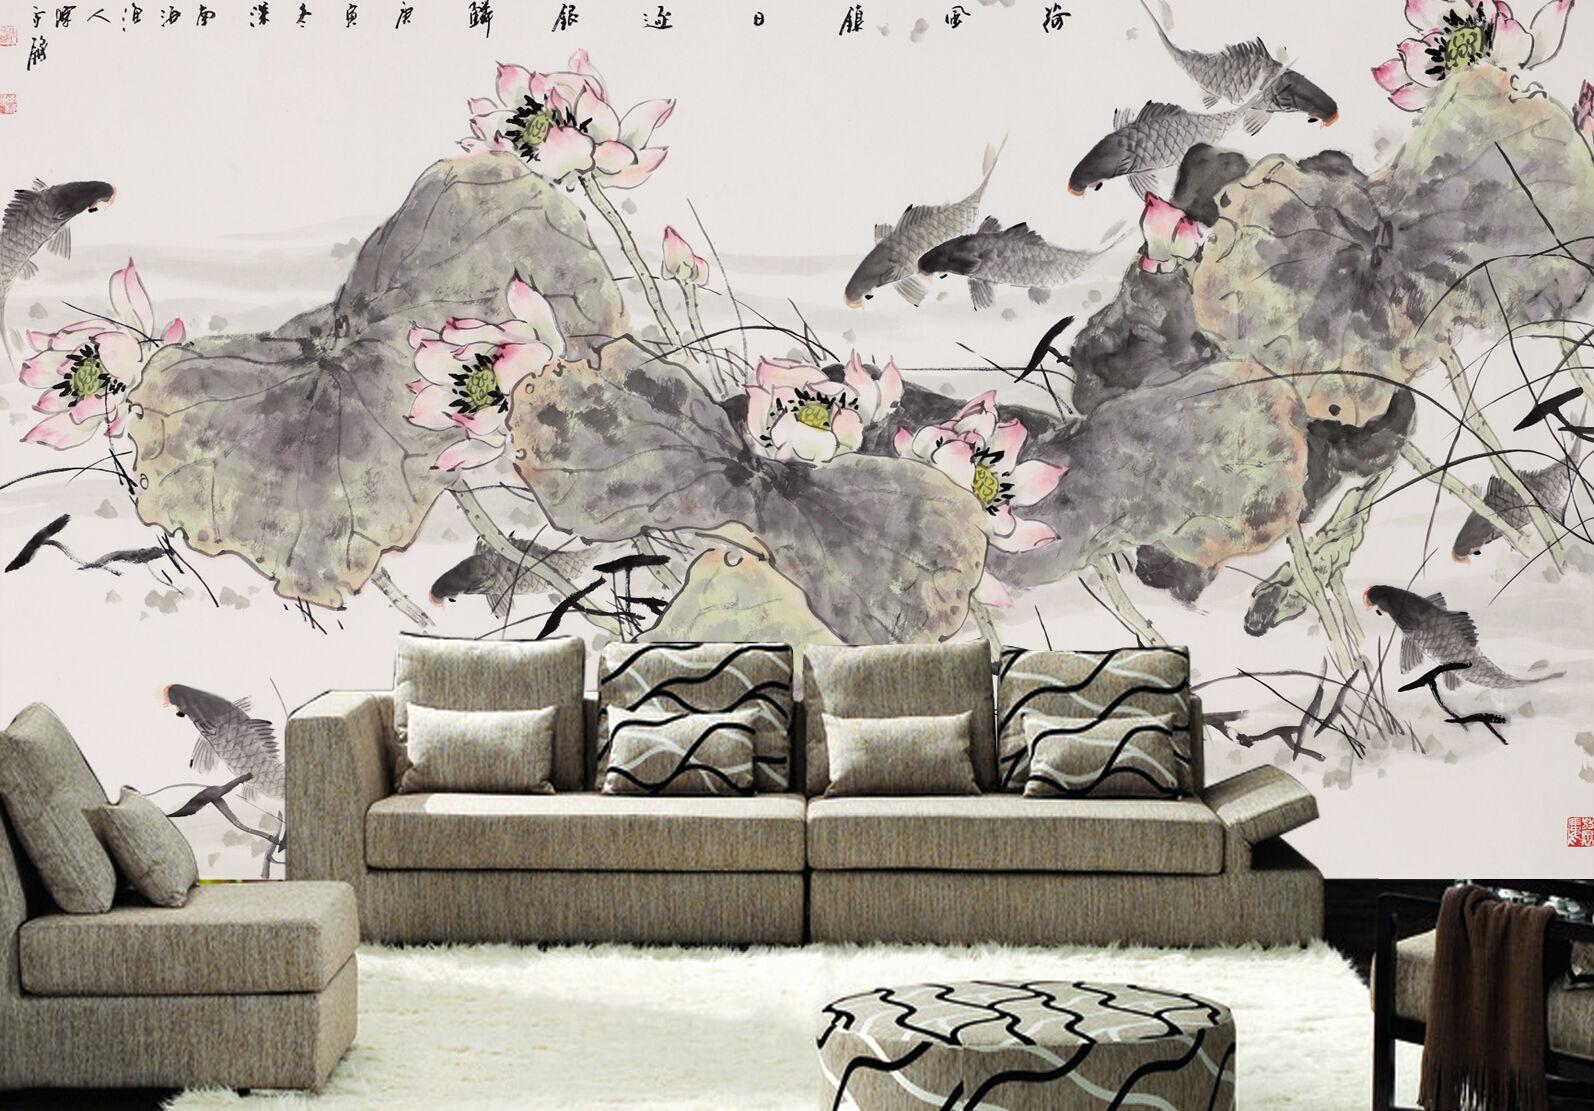 3D Leaves scatteROT 5 WallPaper Murals Wall Print Decal Wall Deco AJ WALLPAPER